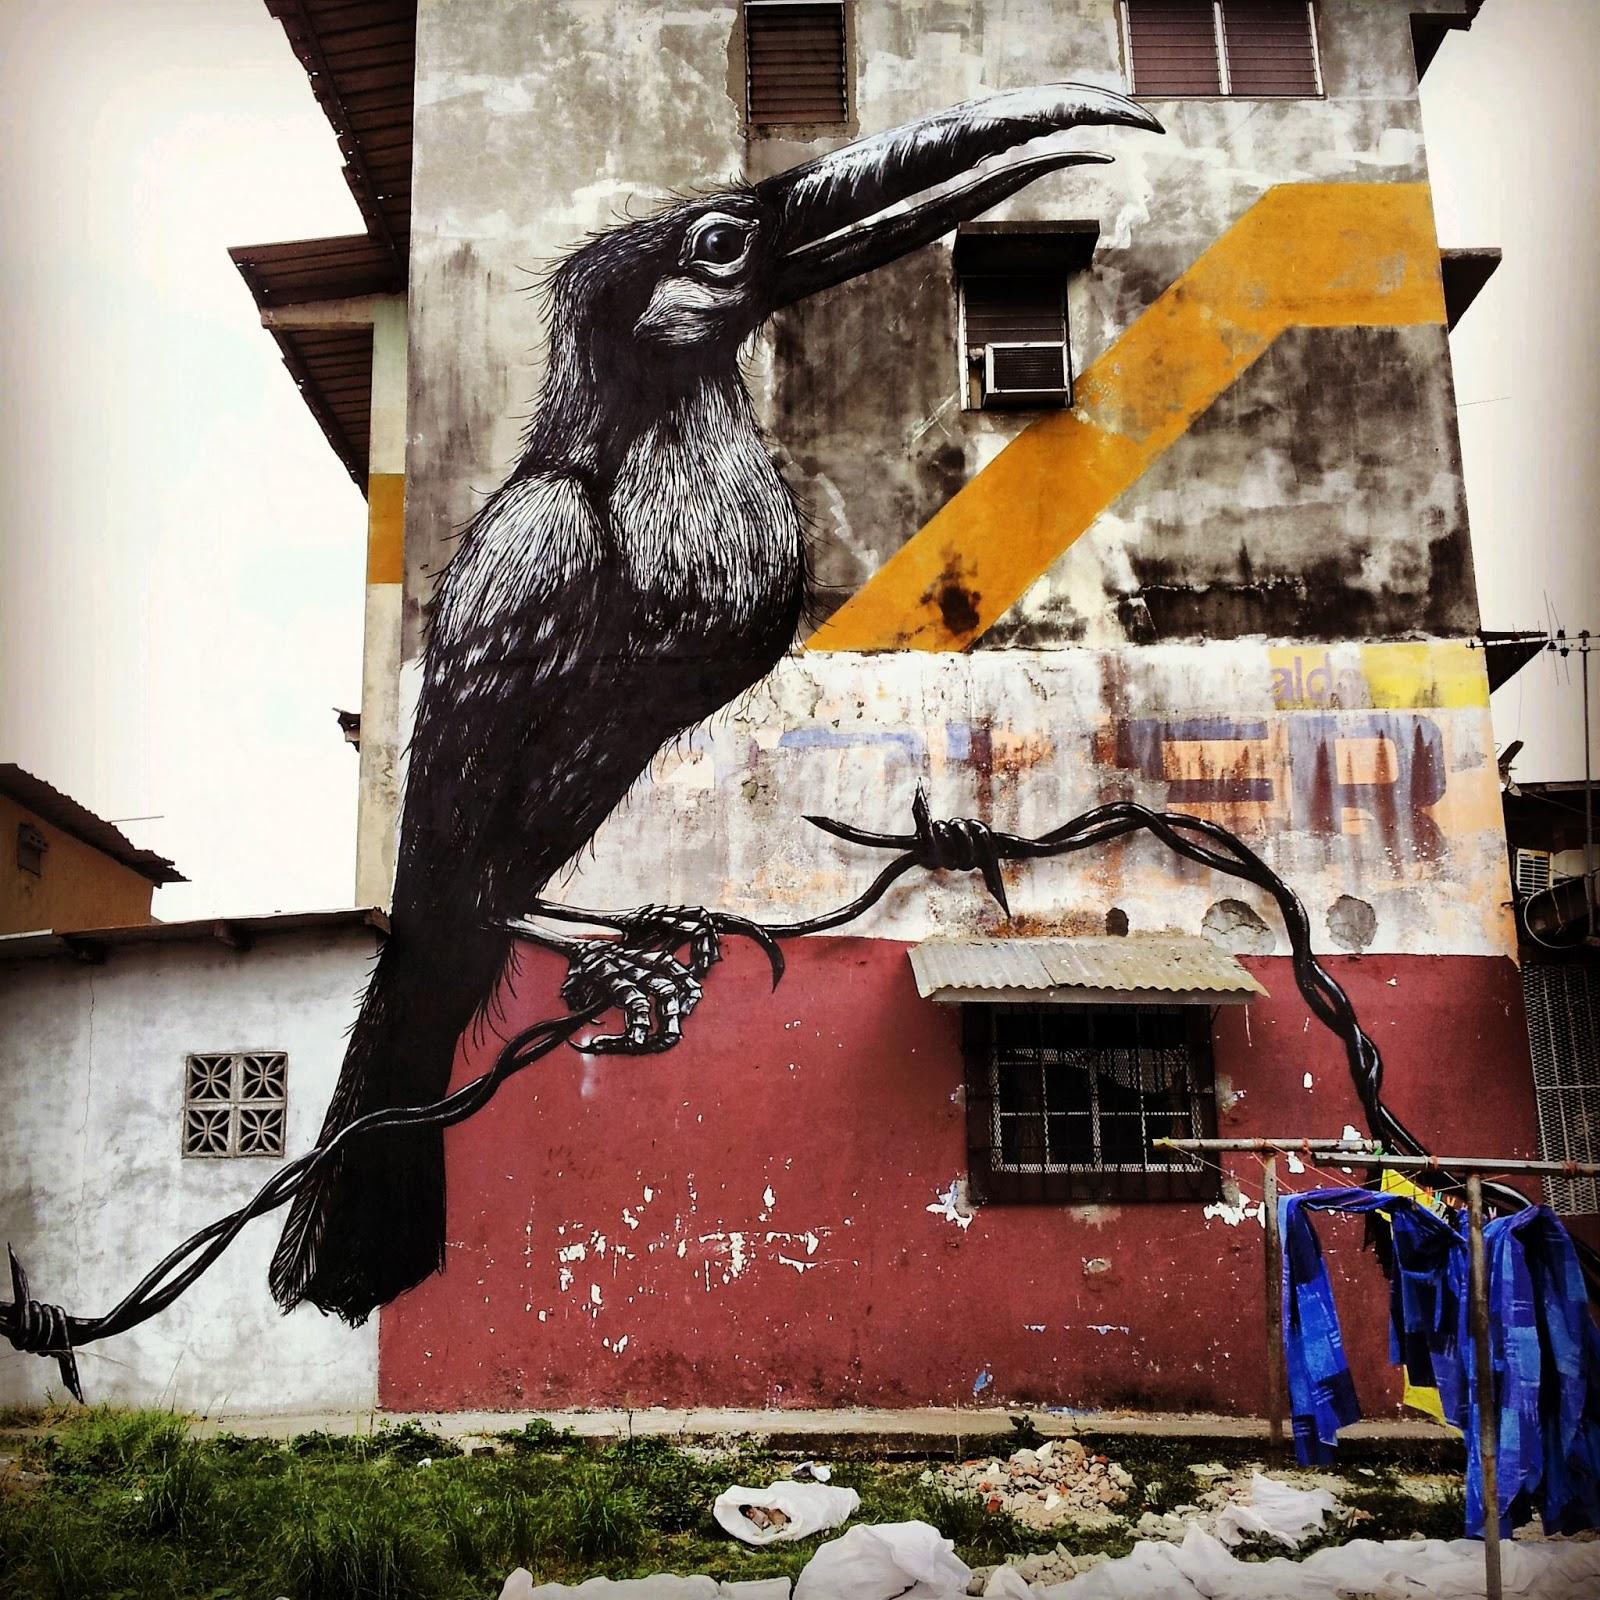 Roa new murals in panama city panama streetartnews for Mural street art